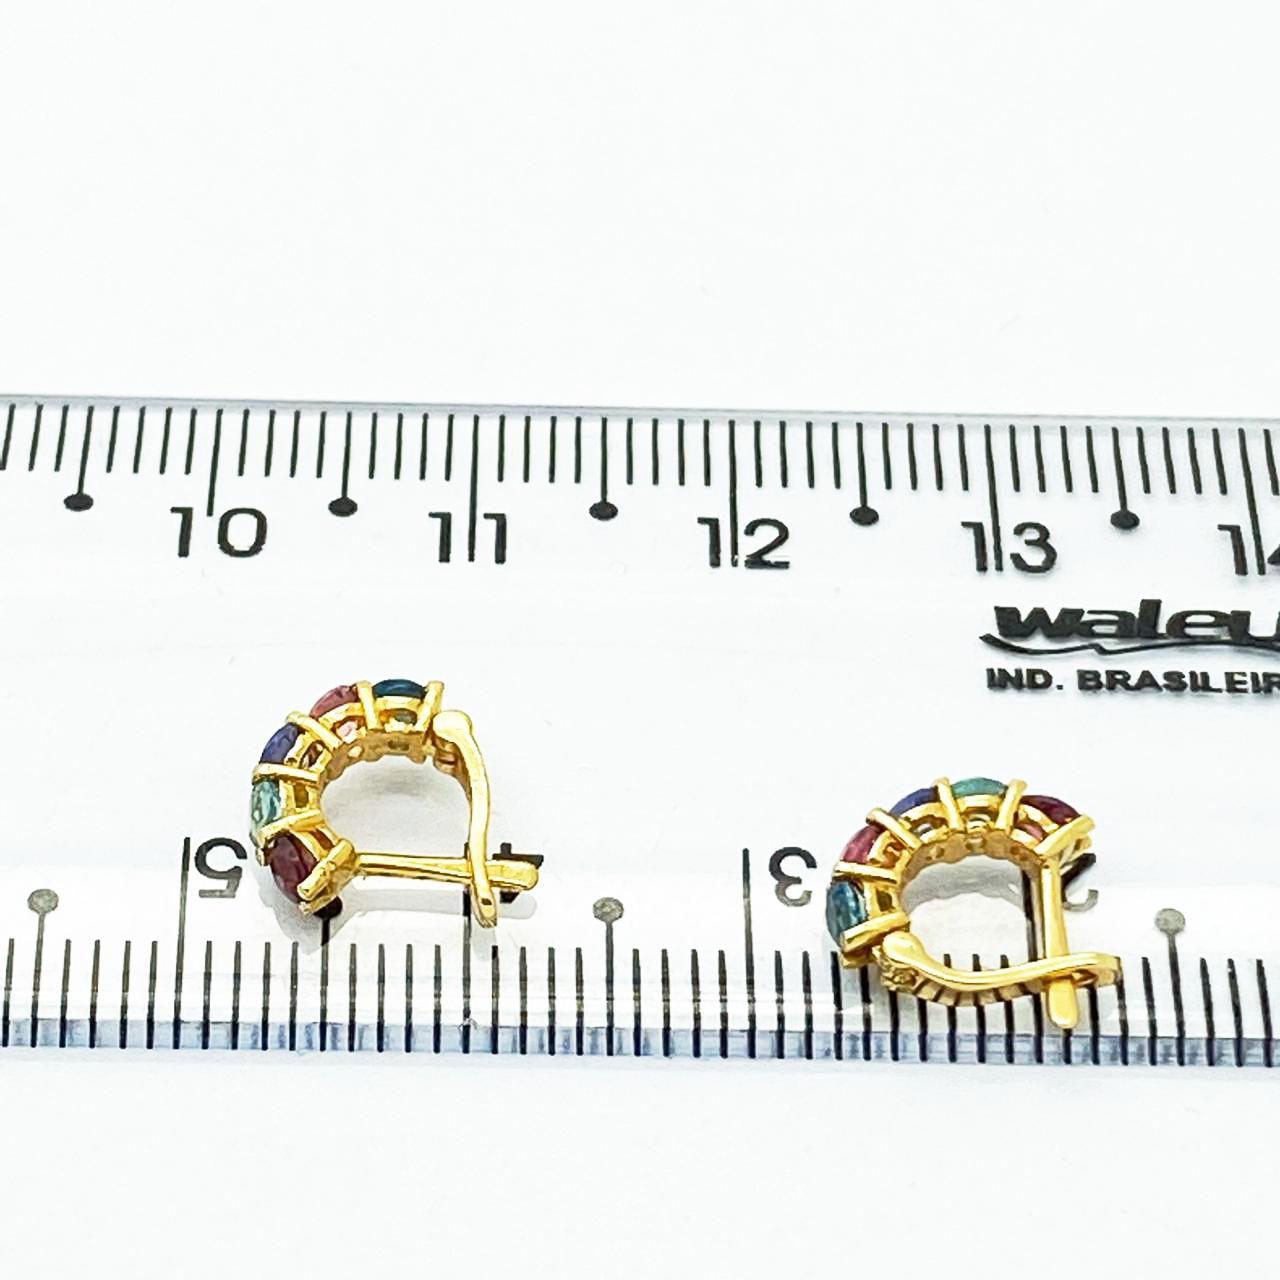 Brinco Piercing Ouro Maciço 18k Argola 5mm 10 Pedra Natural Colorida k3